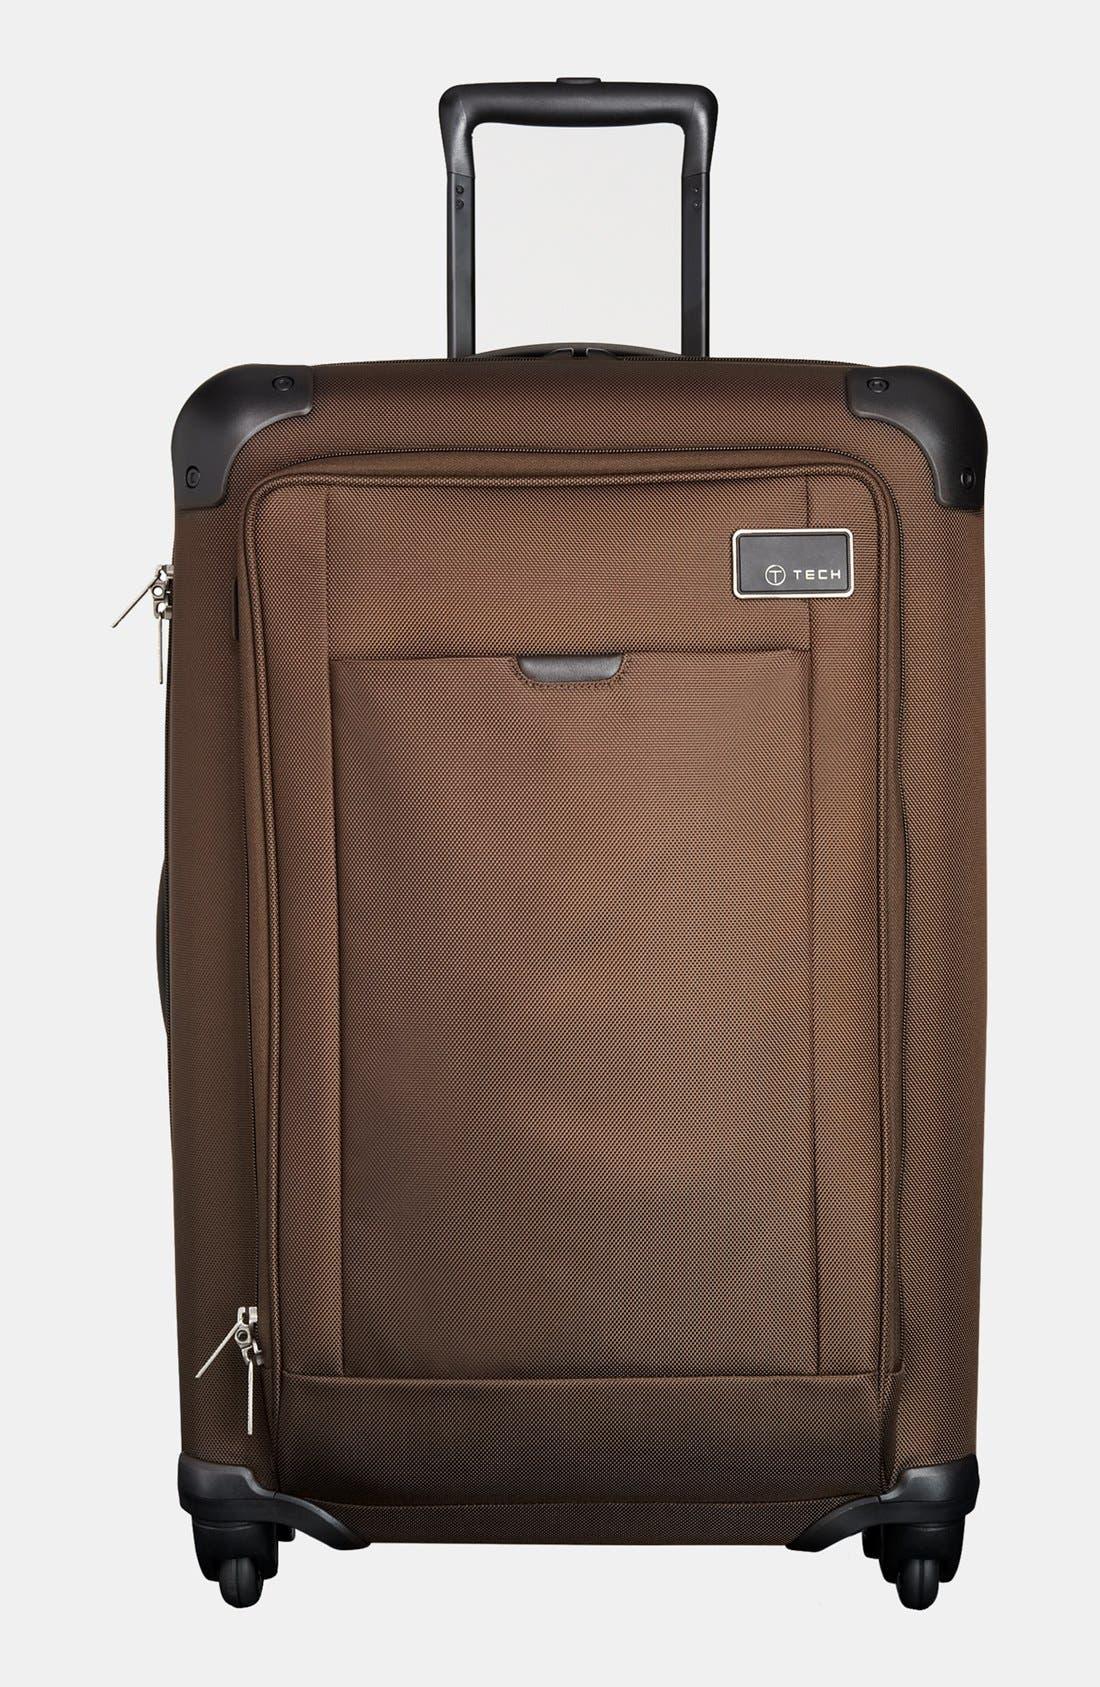 Main Image - Tumi 'T-Tech Network' Lightweight 4-Wheeled Medium Trip Packing Case